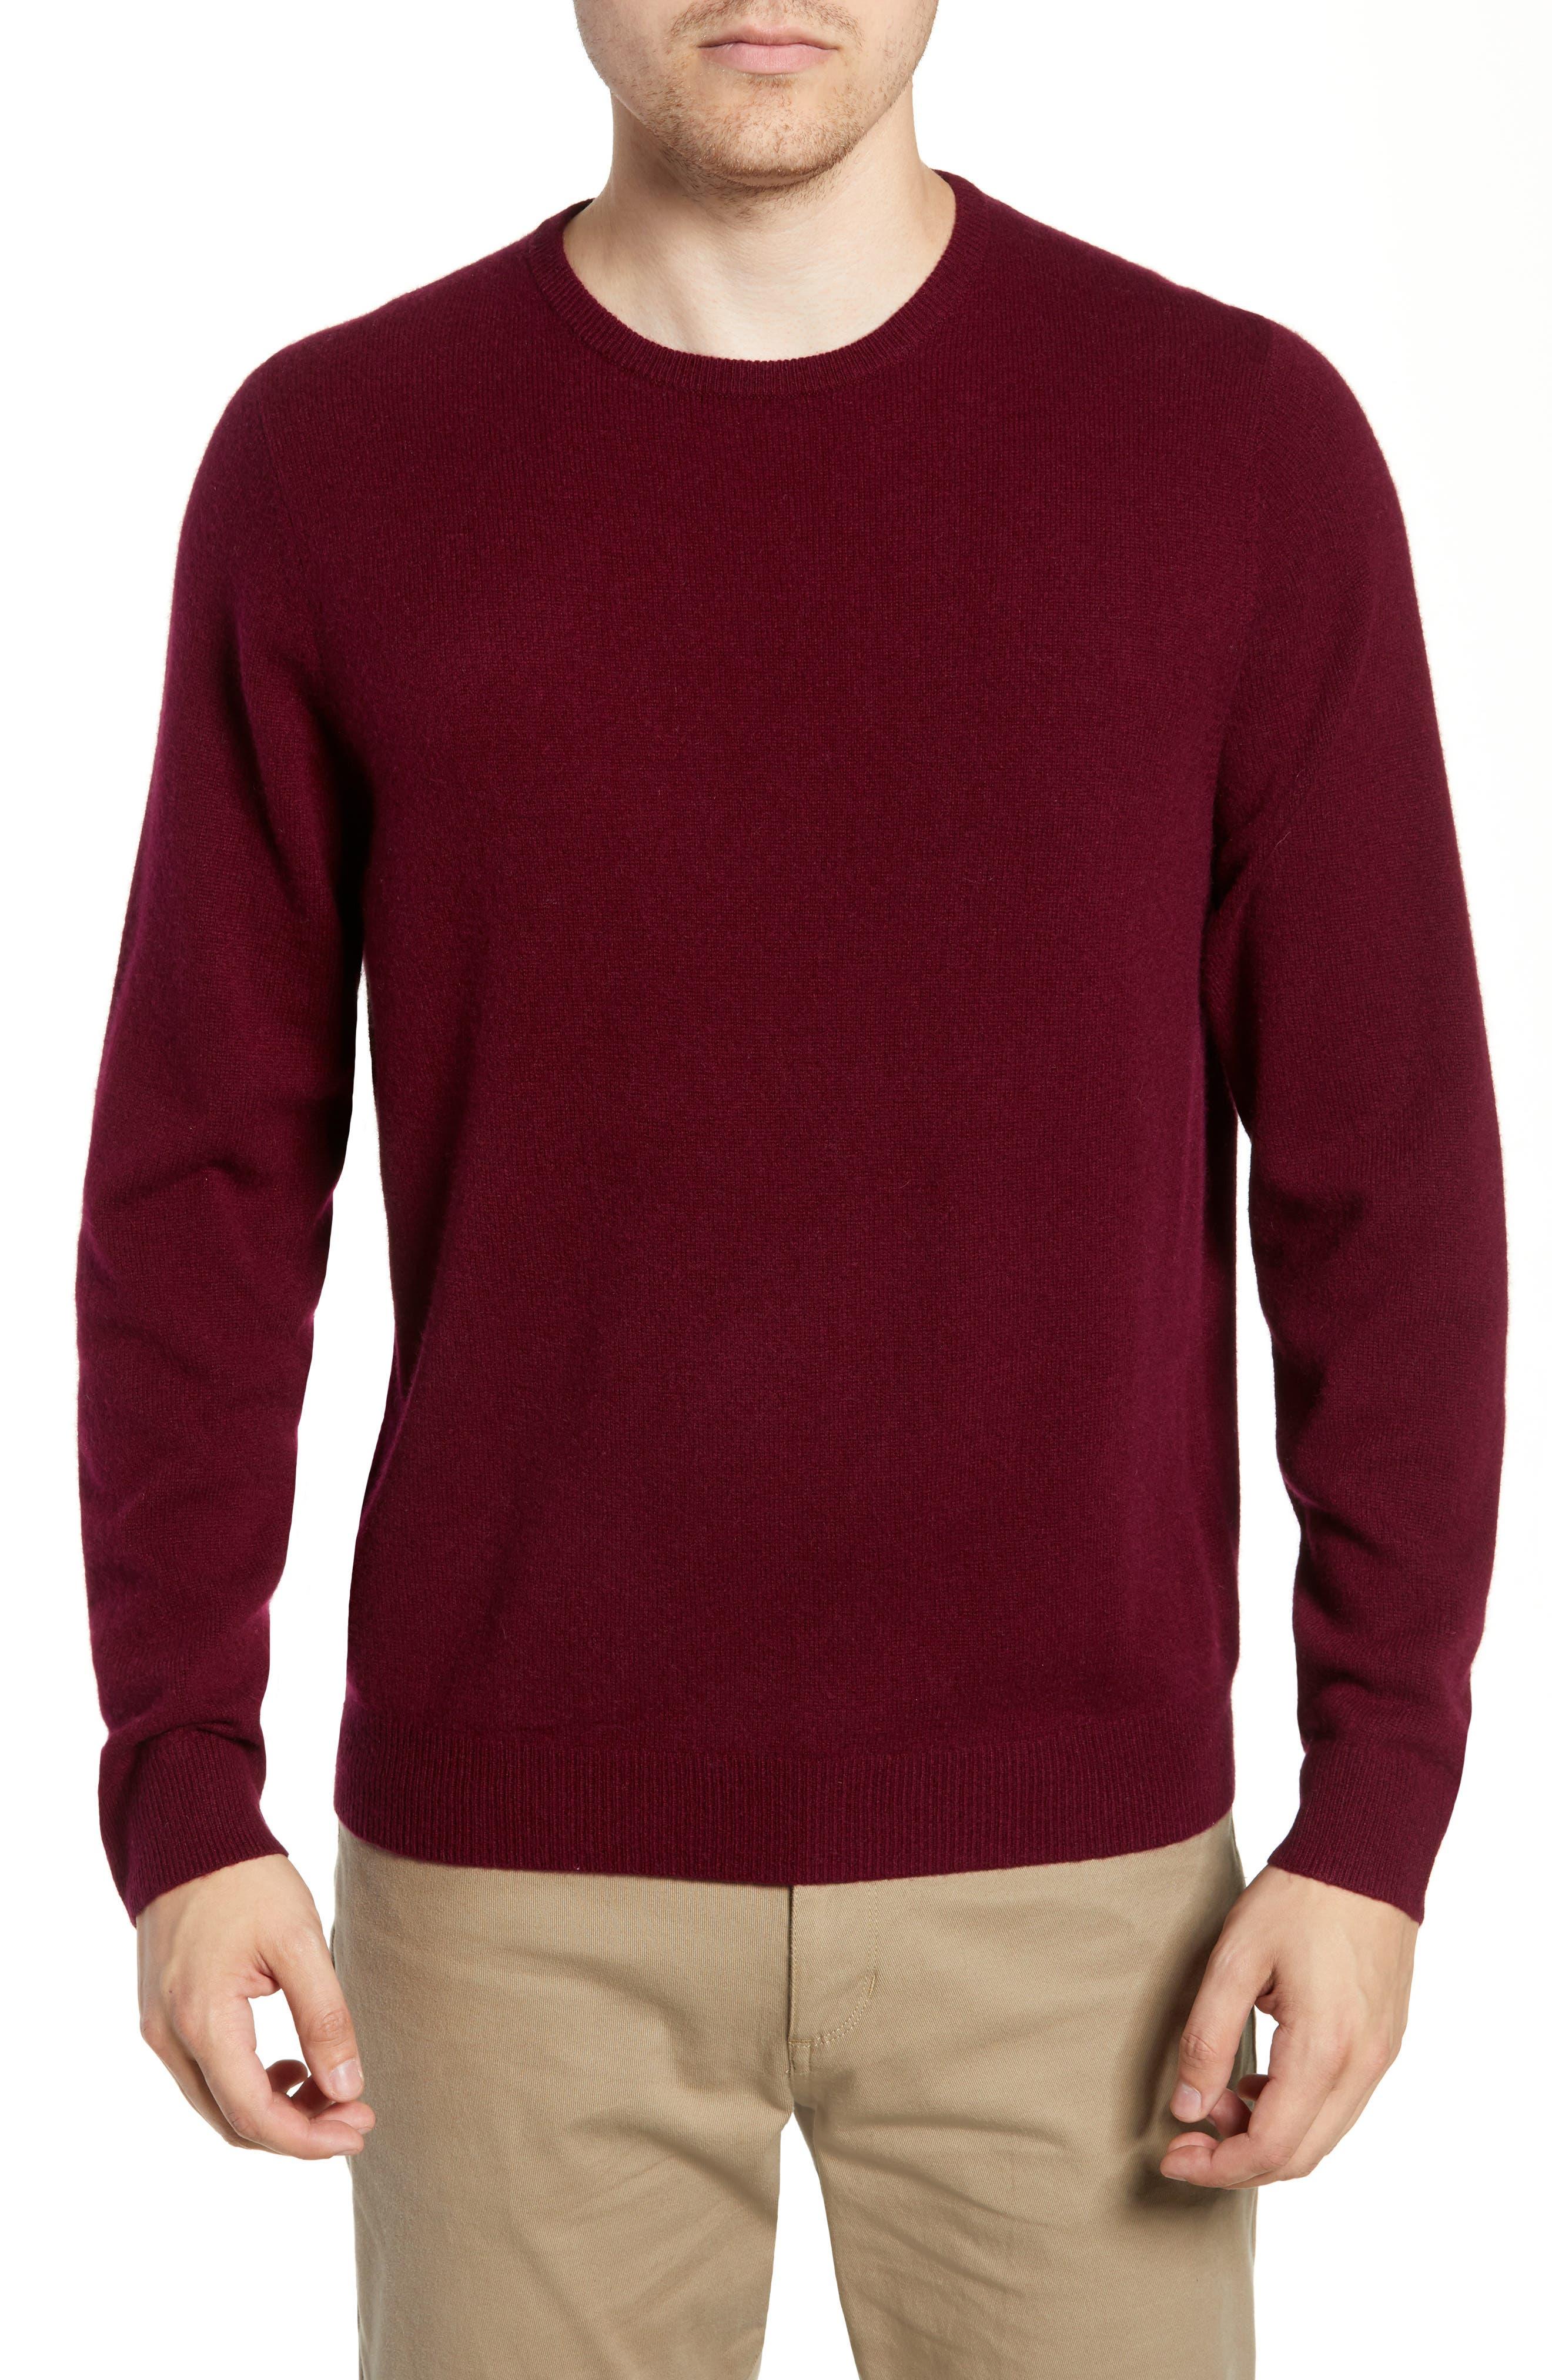 Nordstrom Shop Cashmere Crewneck Sweater, Burgundy